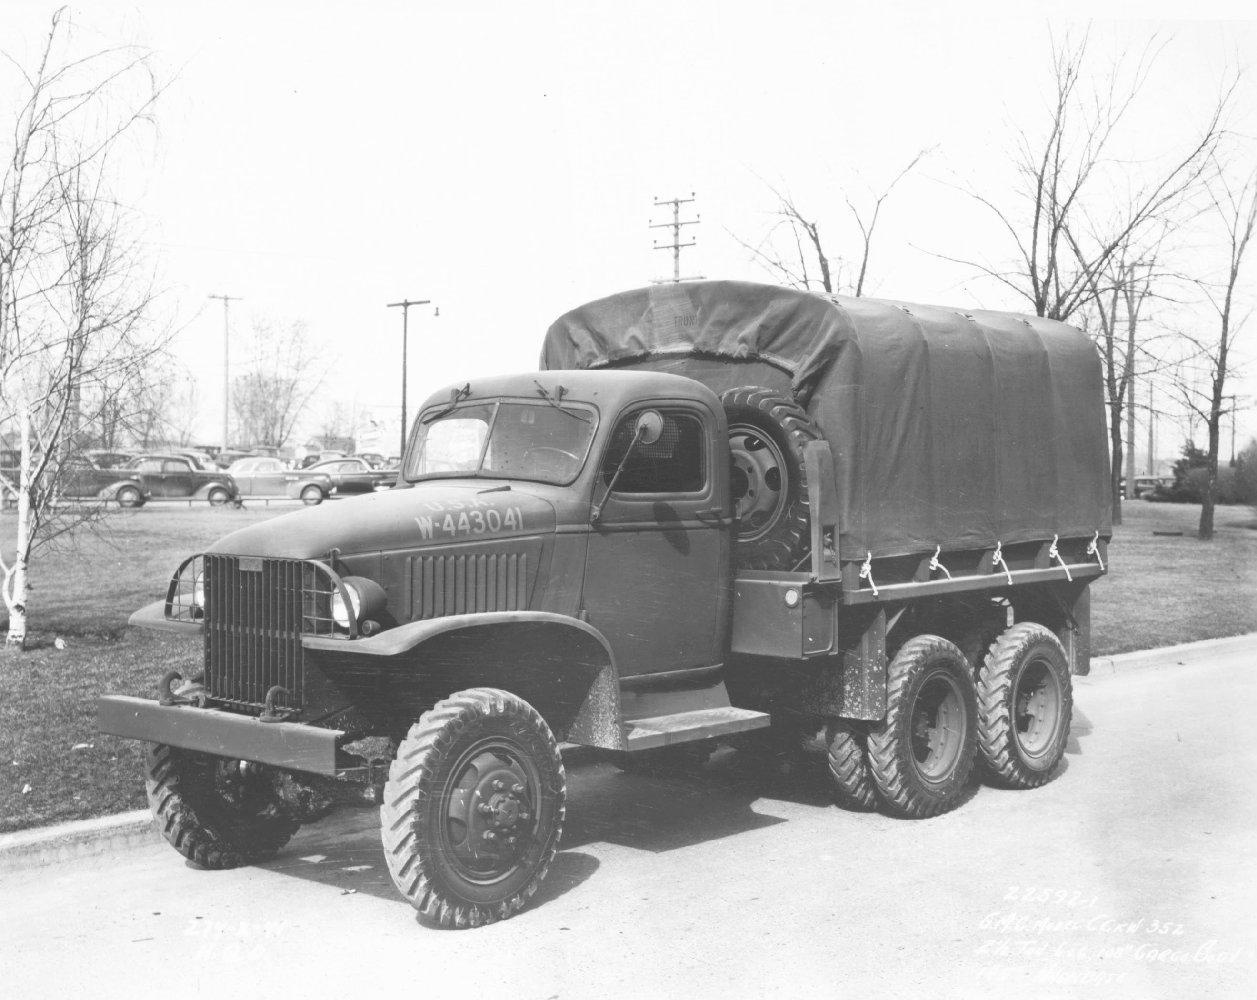 GMC_CCKW_SWB_6x6_Truck.jpg